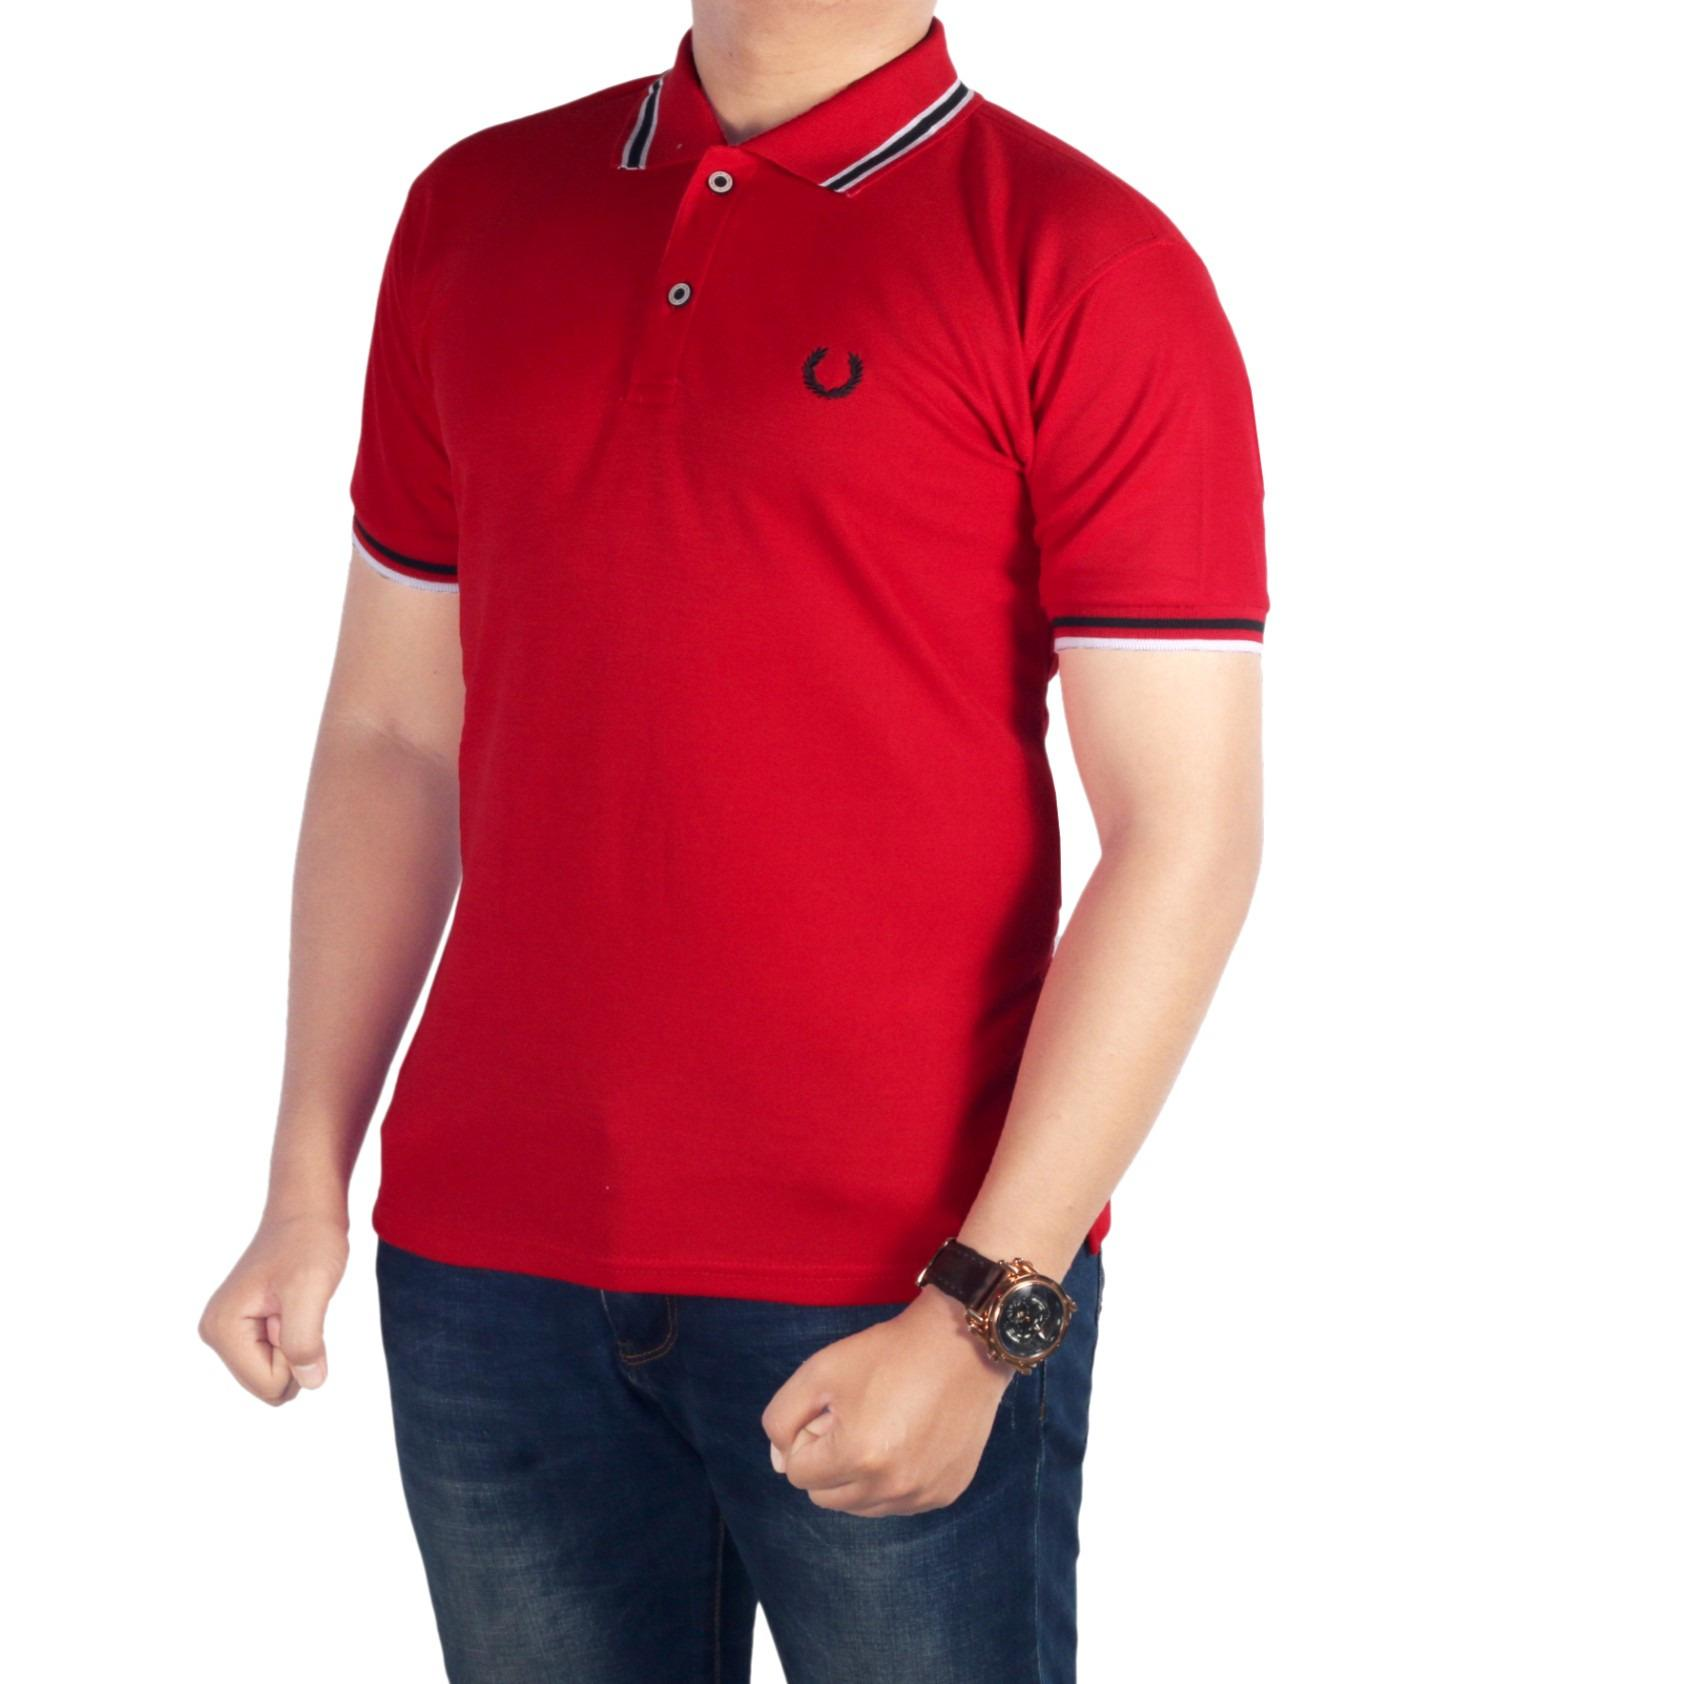 bsg_fashion1 Kaos Polo Kerah Pria Merah/Polo Shirt Kerah Sanghai Pantai/Kaos Polo/kaos t-shirt/kaos distro/t-shirt o-Neck/kaos polos/t-shirt raglan/kaos lengan pendek/kaos oblong/kaos pria SP 4548